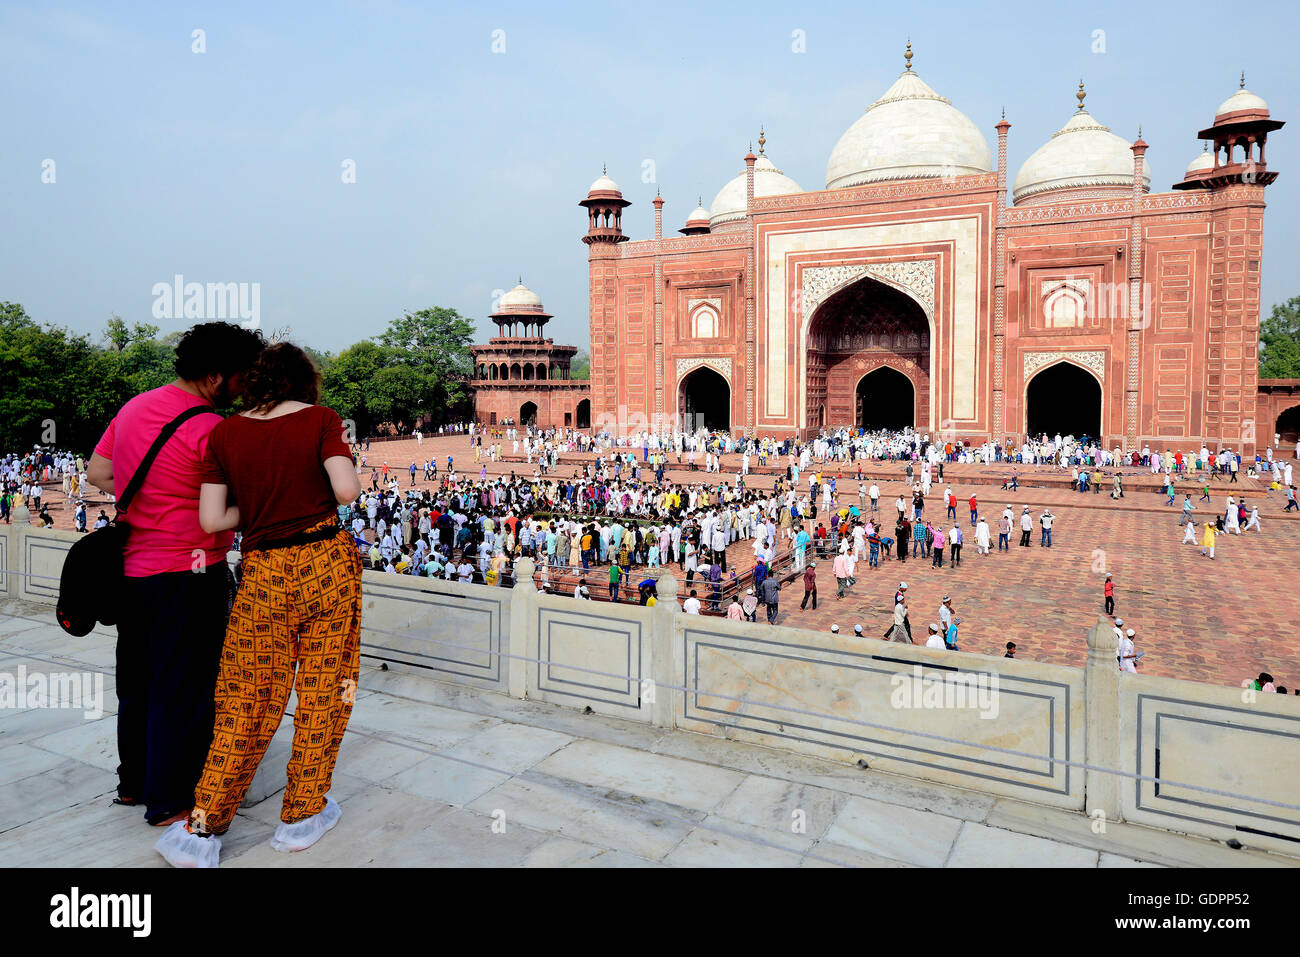 Eid-ul-fitr prayers congregation at the Taj Mahal mosque, Agra, UP, India - Stock Image